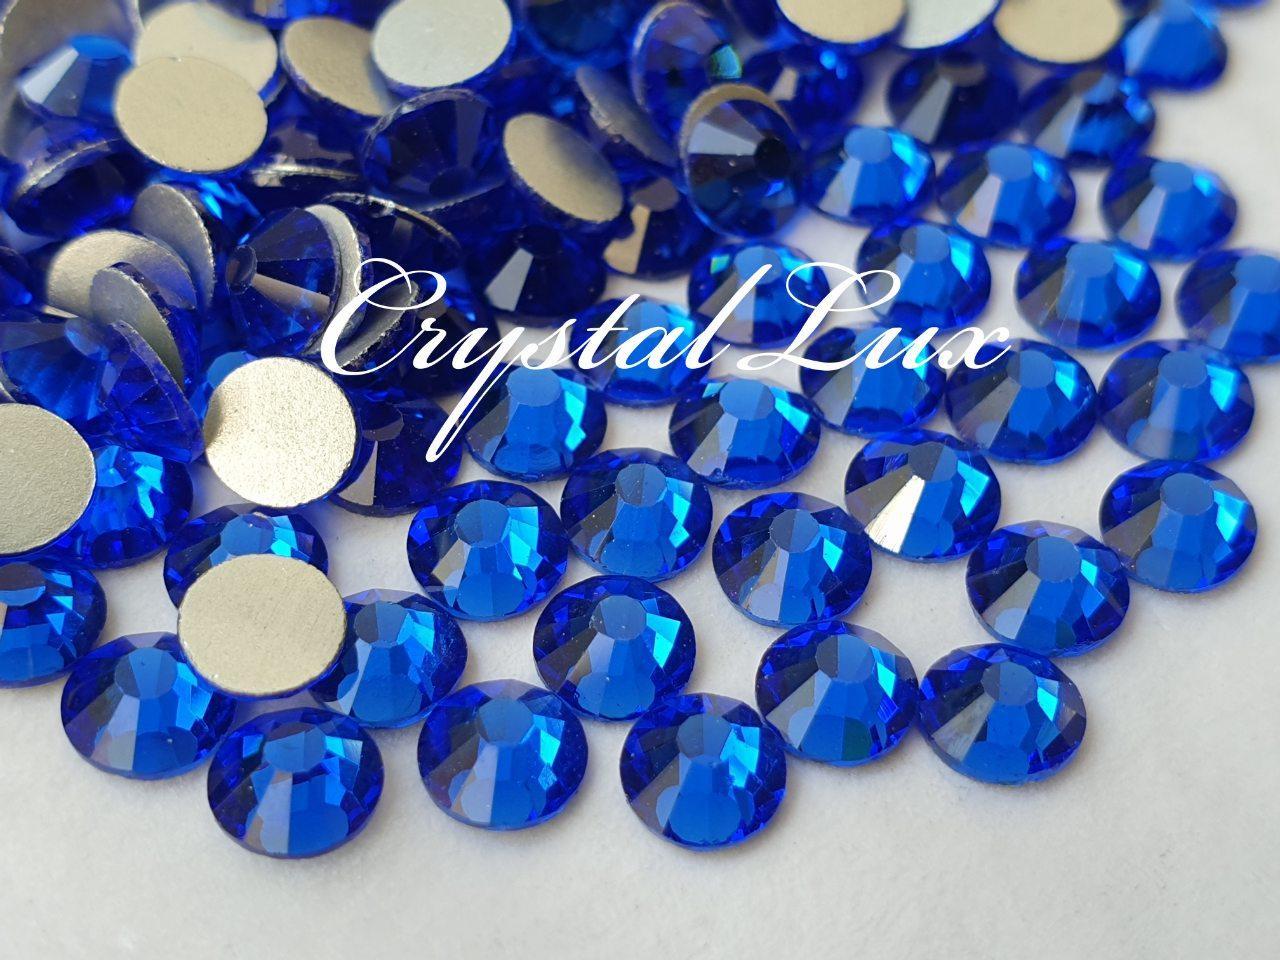 Стразы Lux ss20 Sapphire (5.0mm) 1440шт